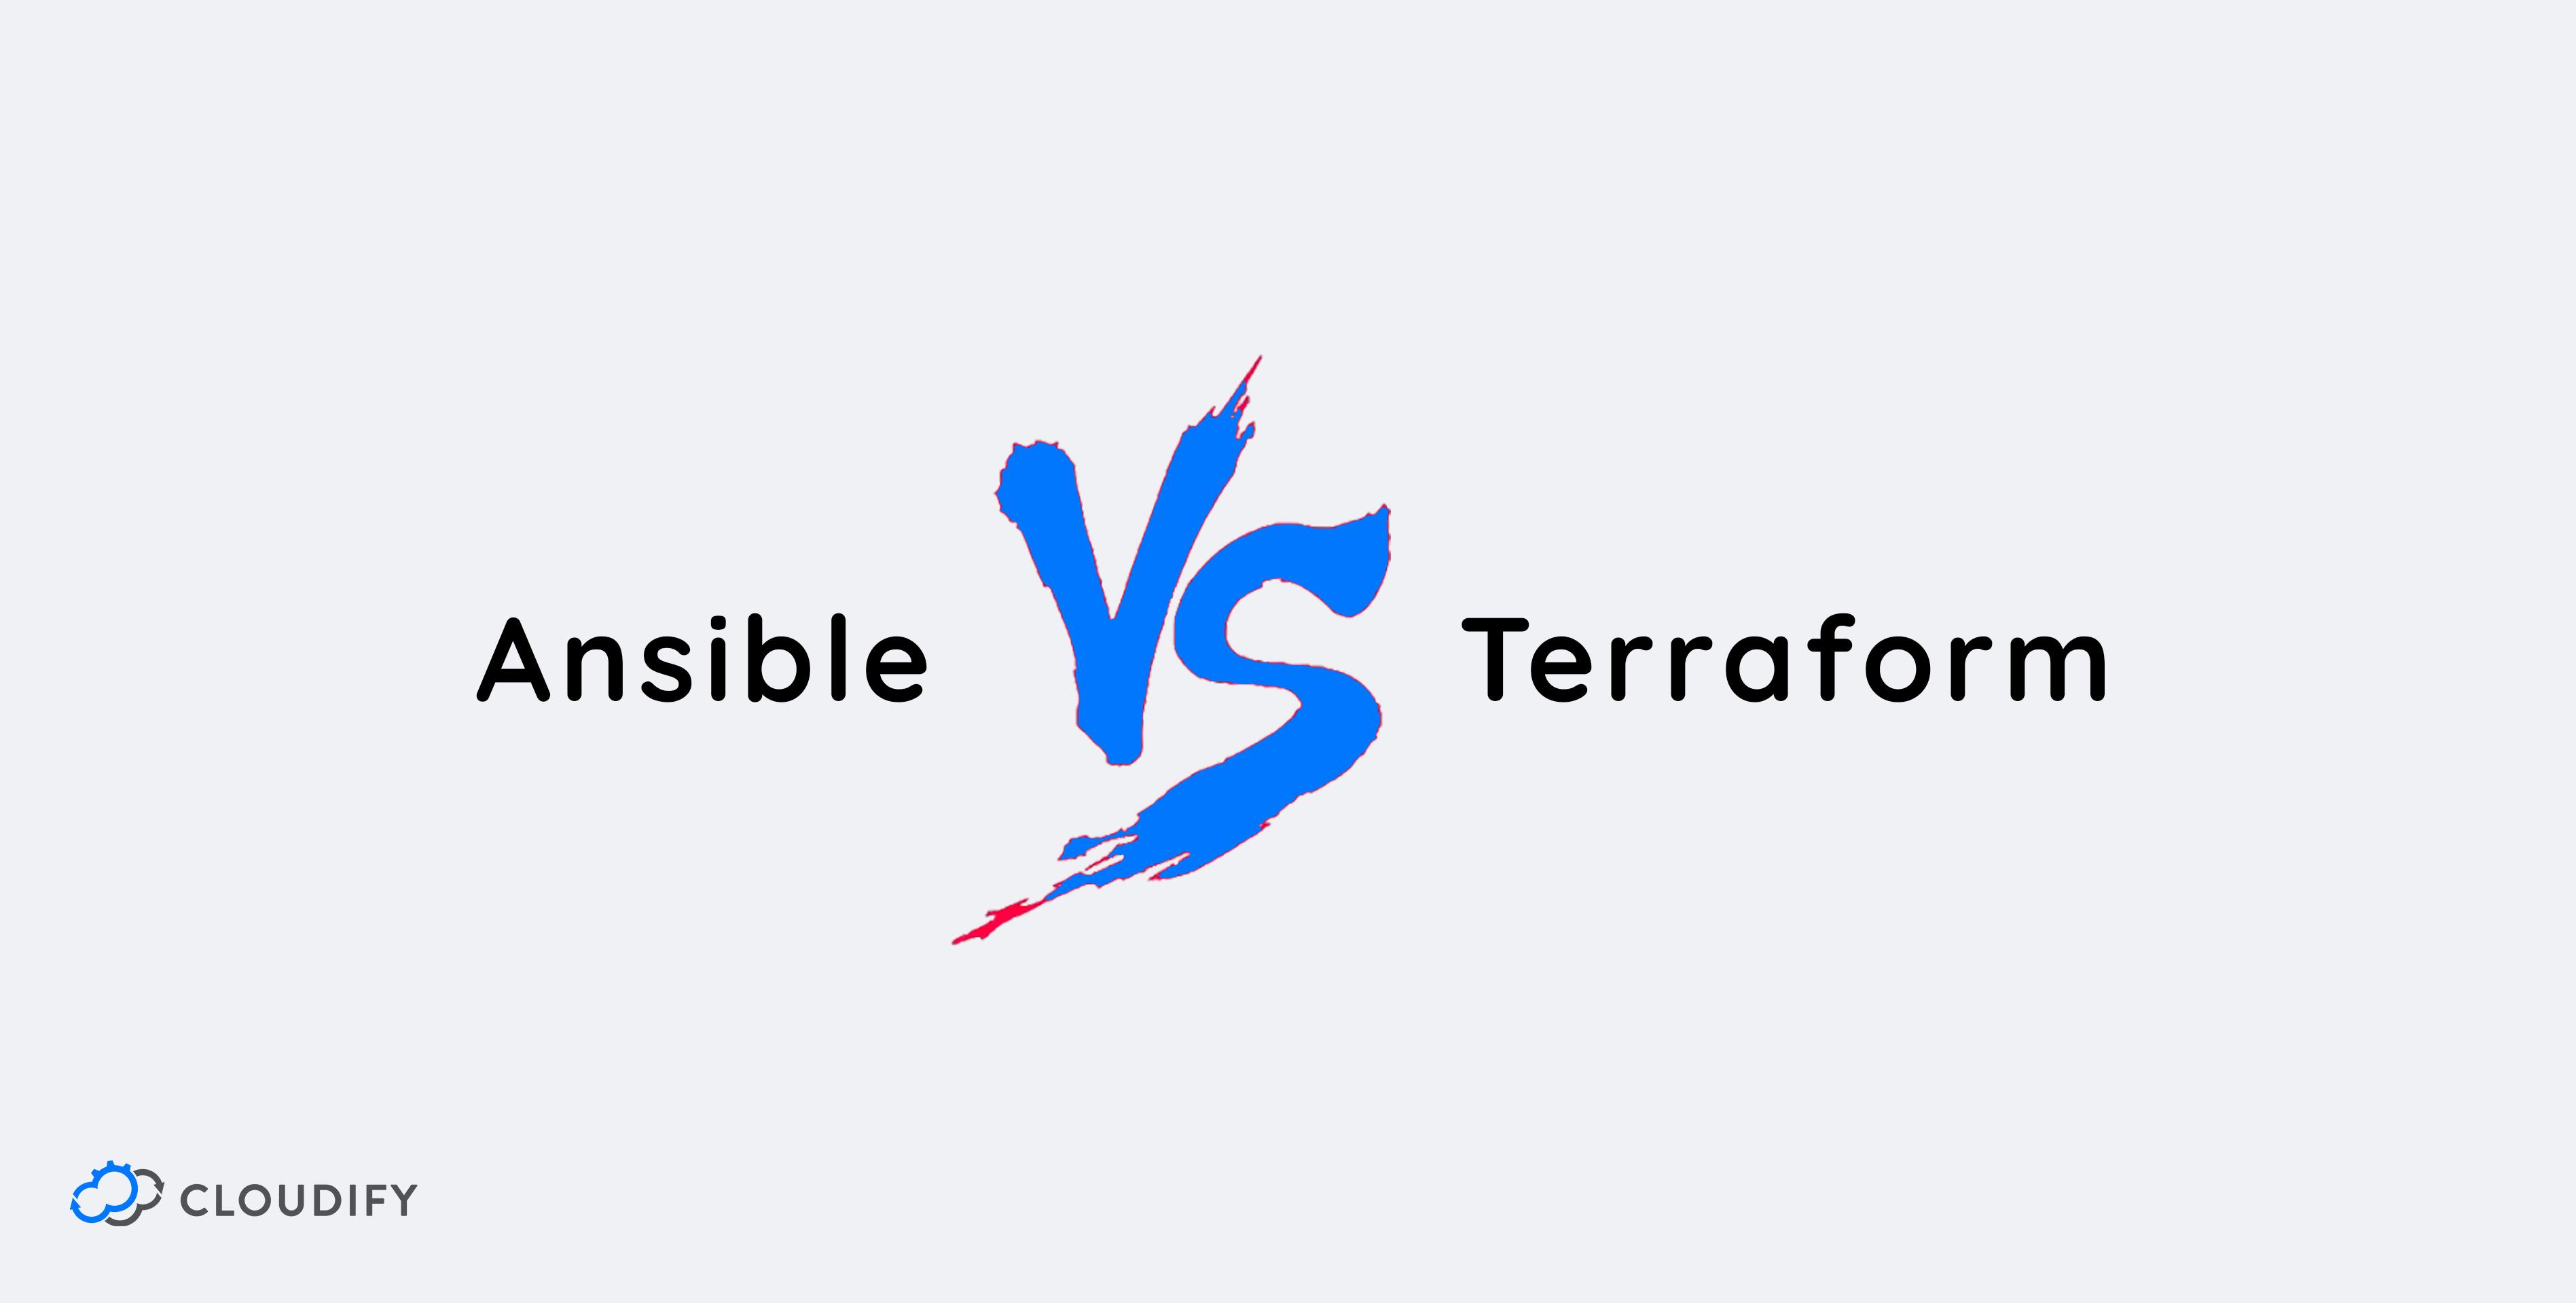 Cloudify | Ansible Terraform